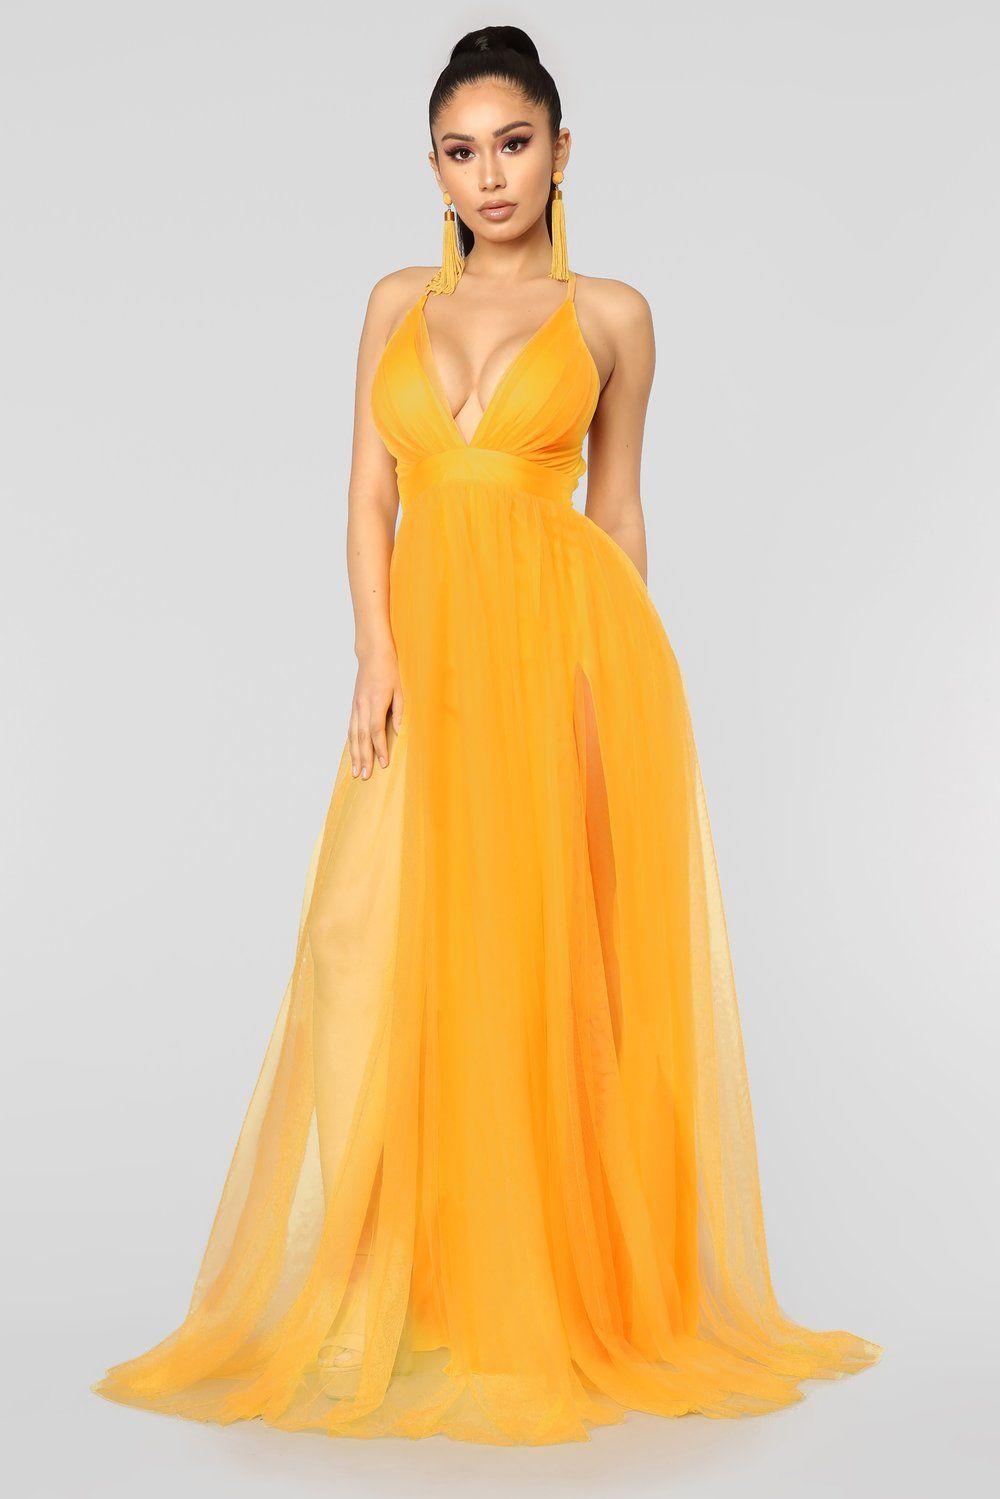 On The Runway Maxi Dress Yellow Maxi dress, Yellow